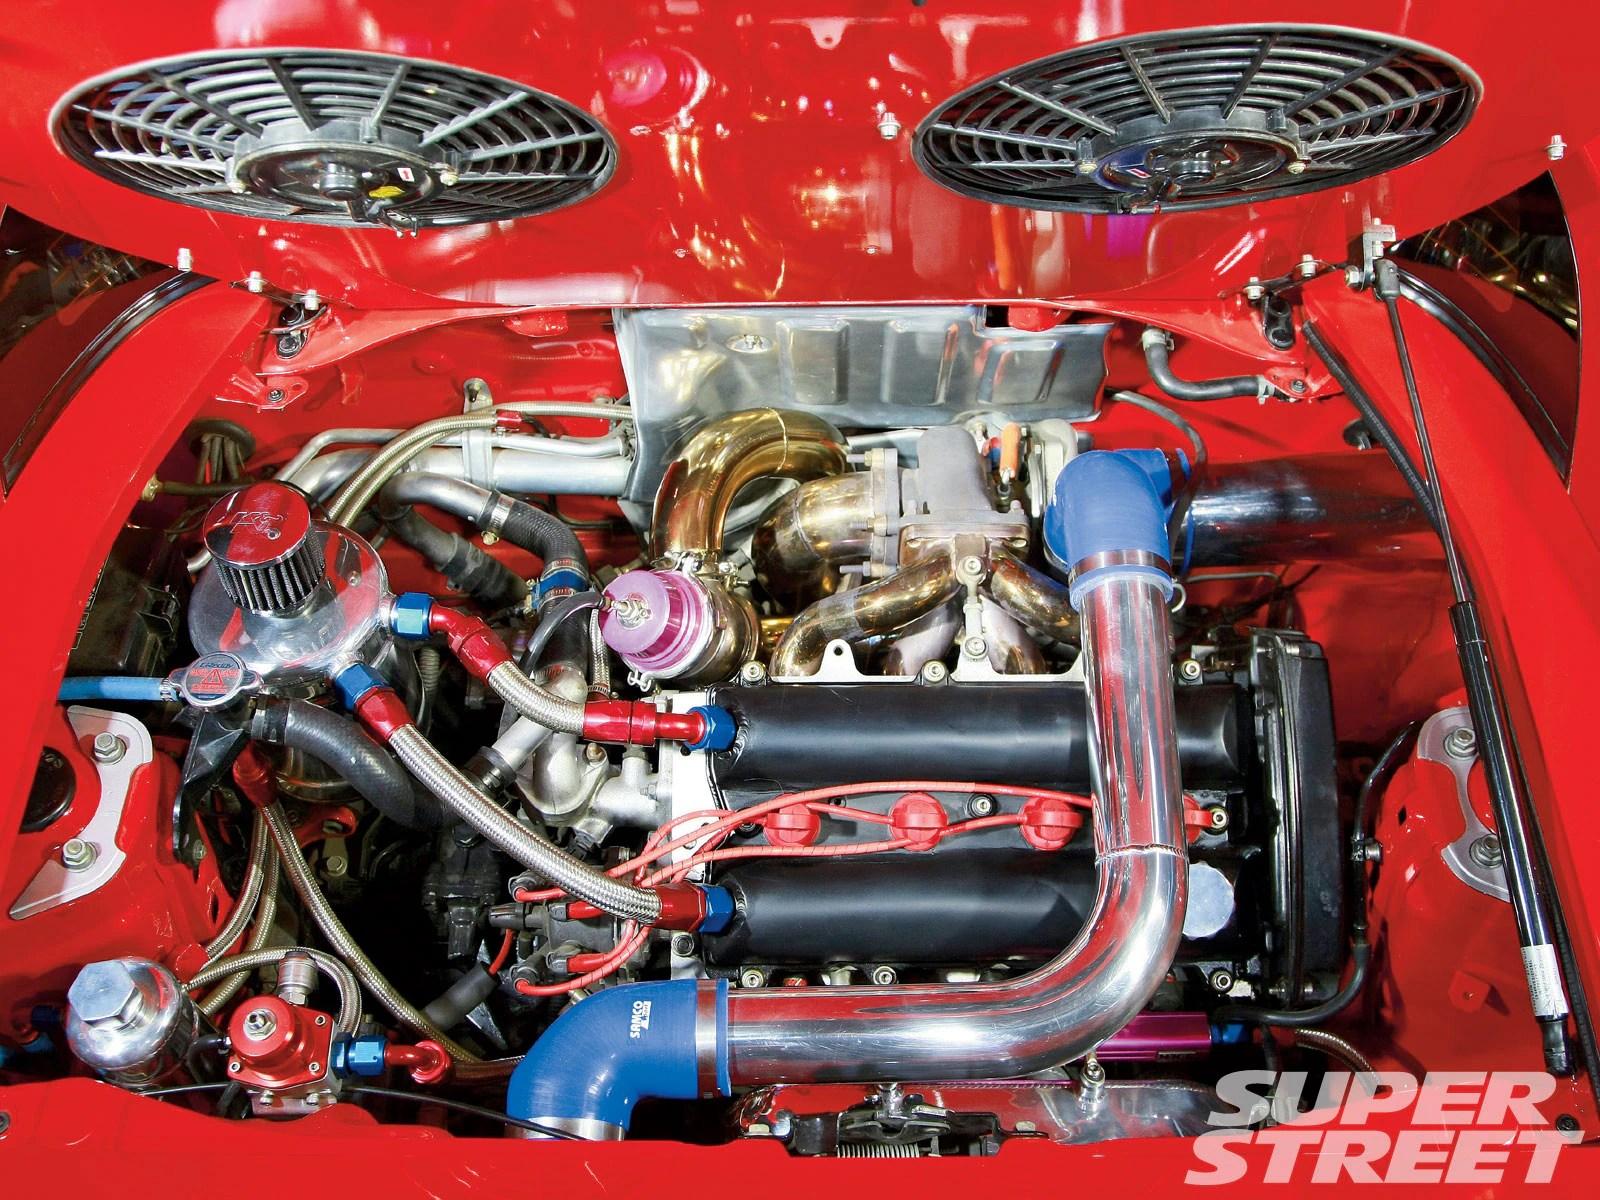 sstp 1011 07 o 1994 toyota mr2 gts 3sgte engine  [ 1600 x 1200 Pixel ]